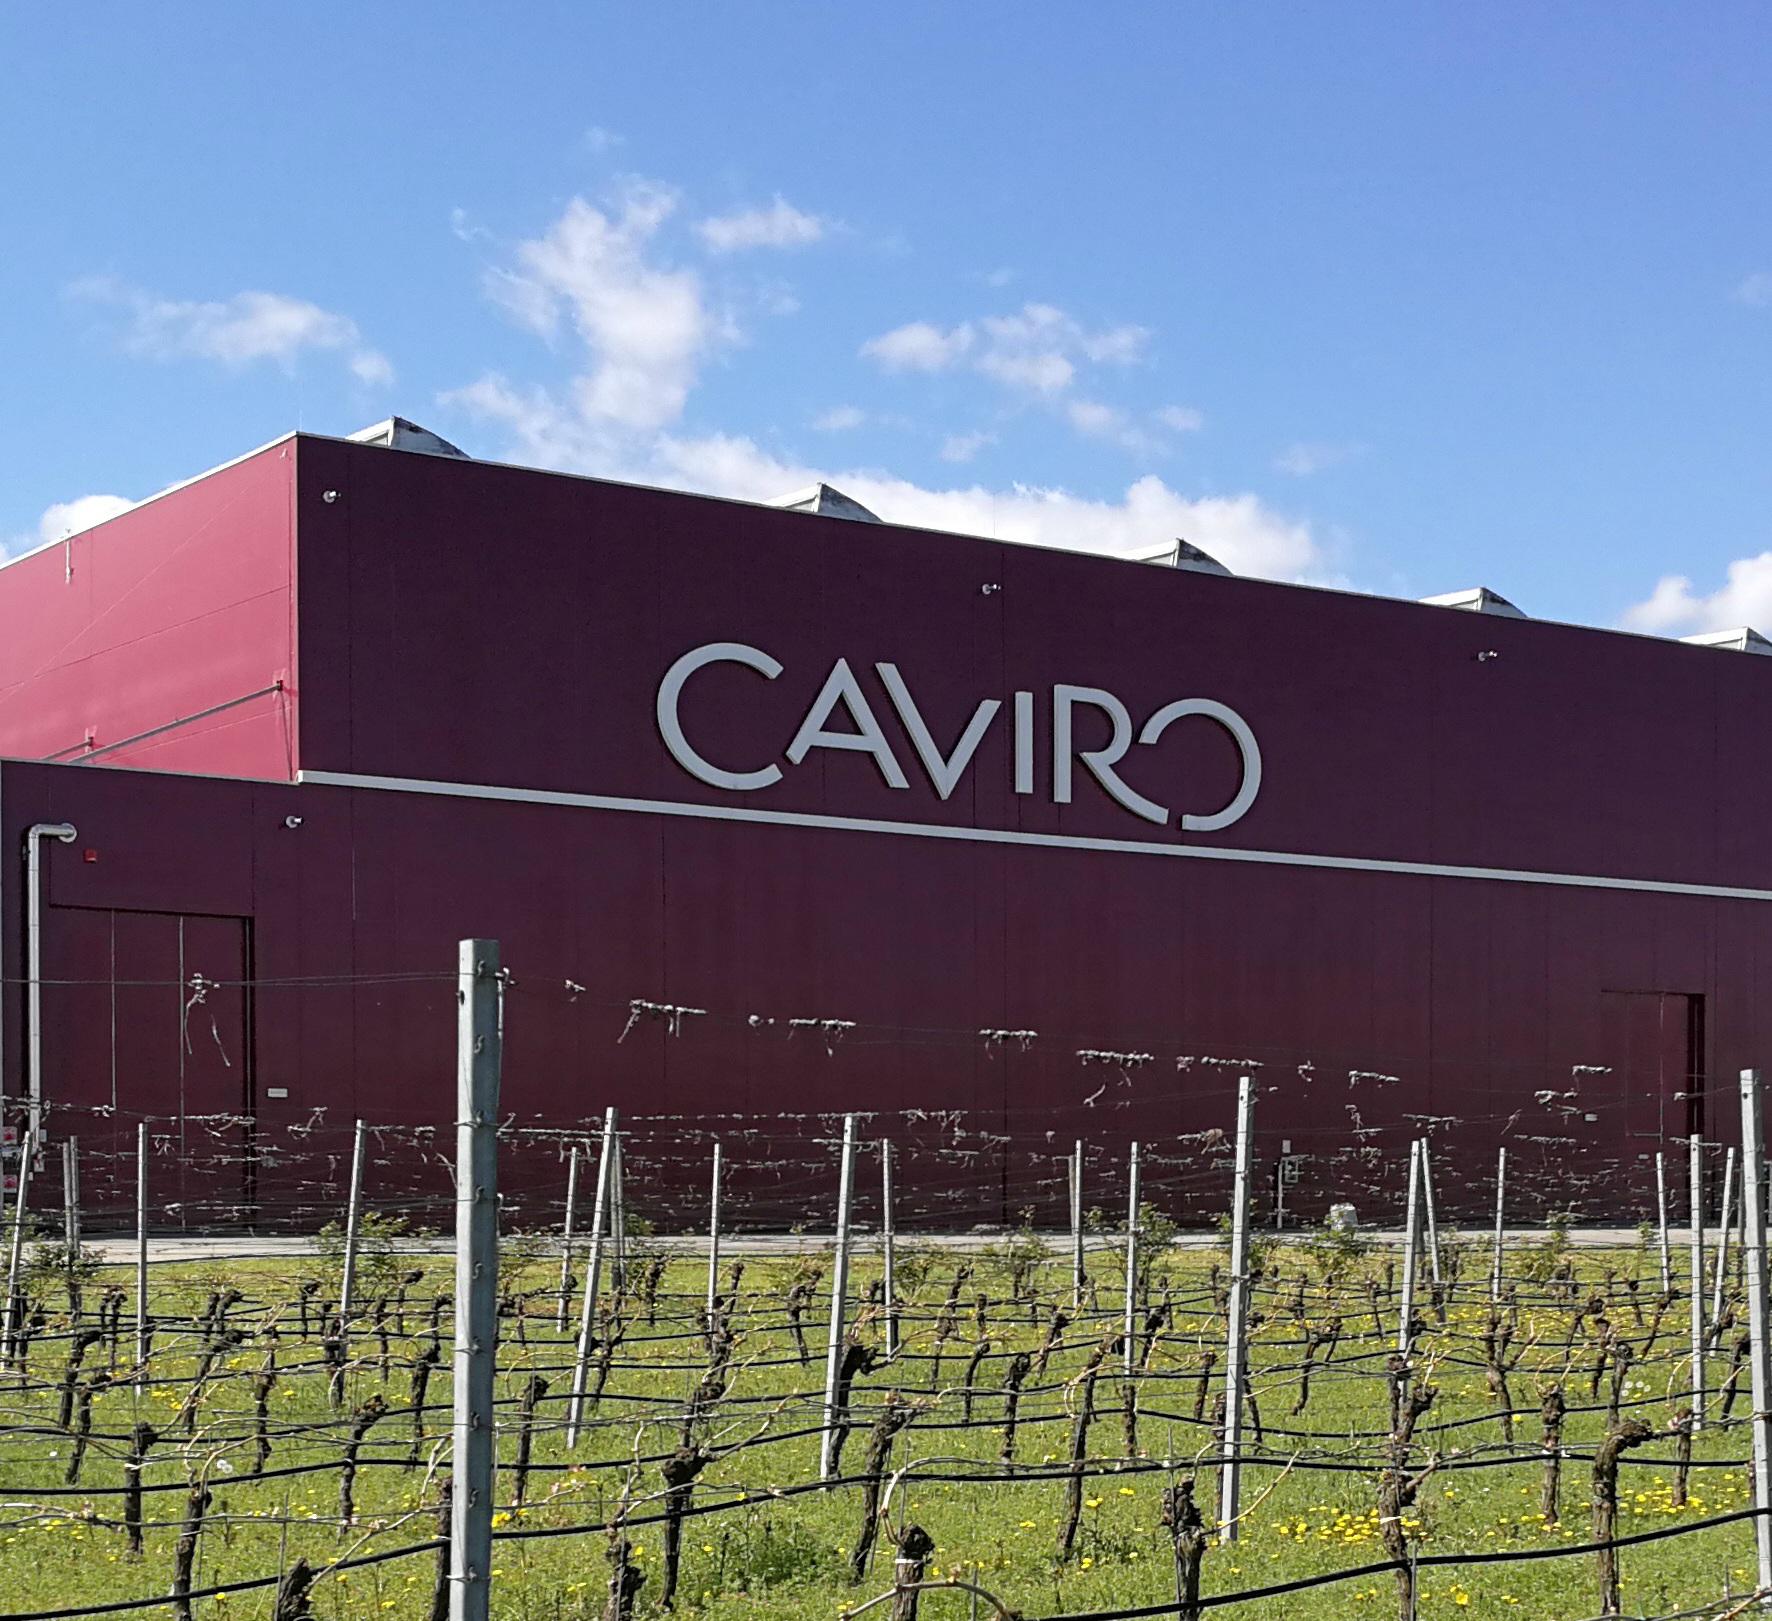 Caviro-Forlì